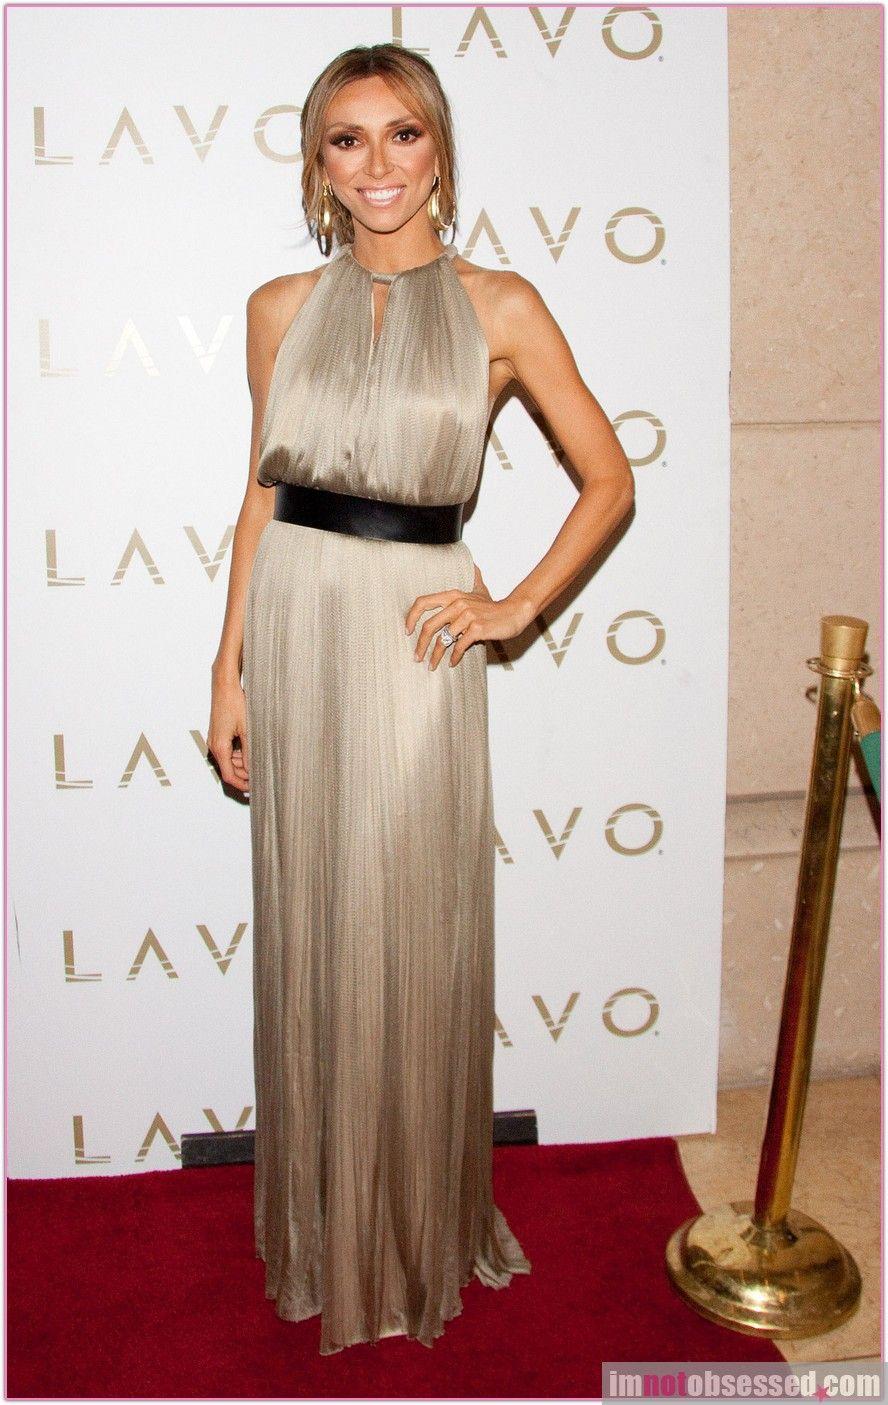 Womens Giuliana Dress Colorado Discount Ebay Clearance Low Price Fee Shipping Latest xdwbqE5